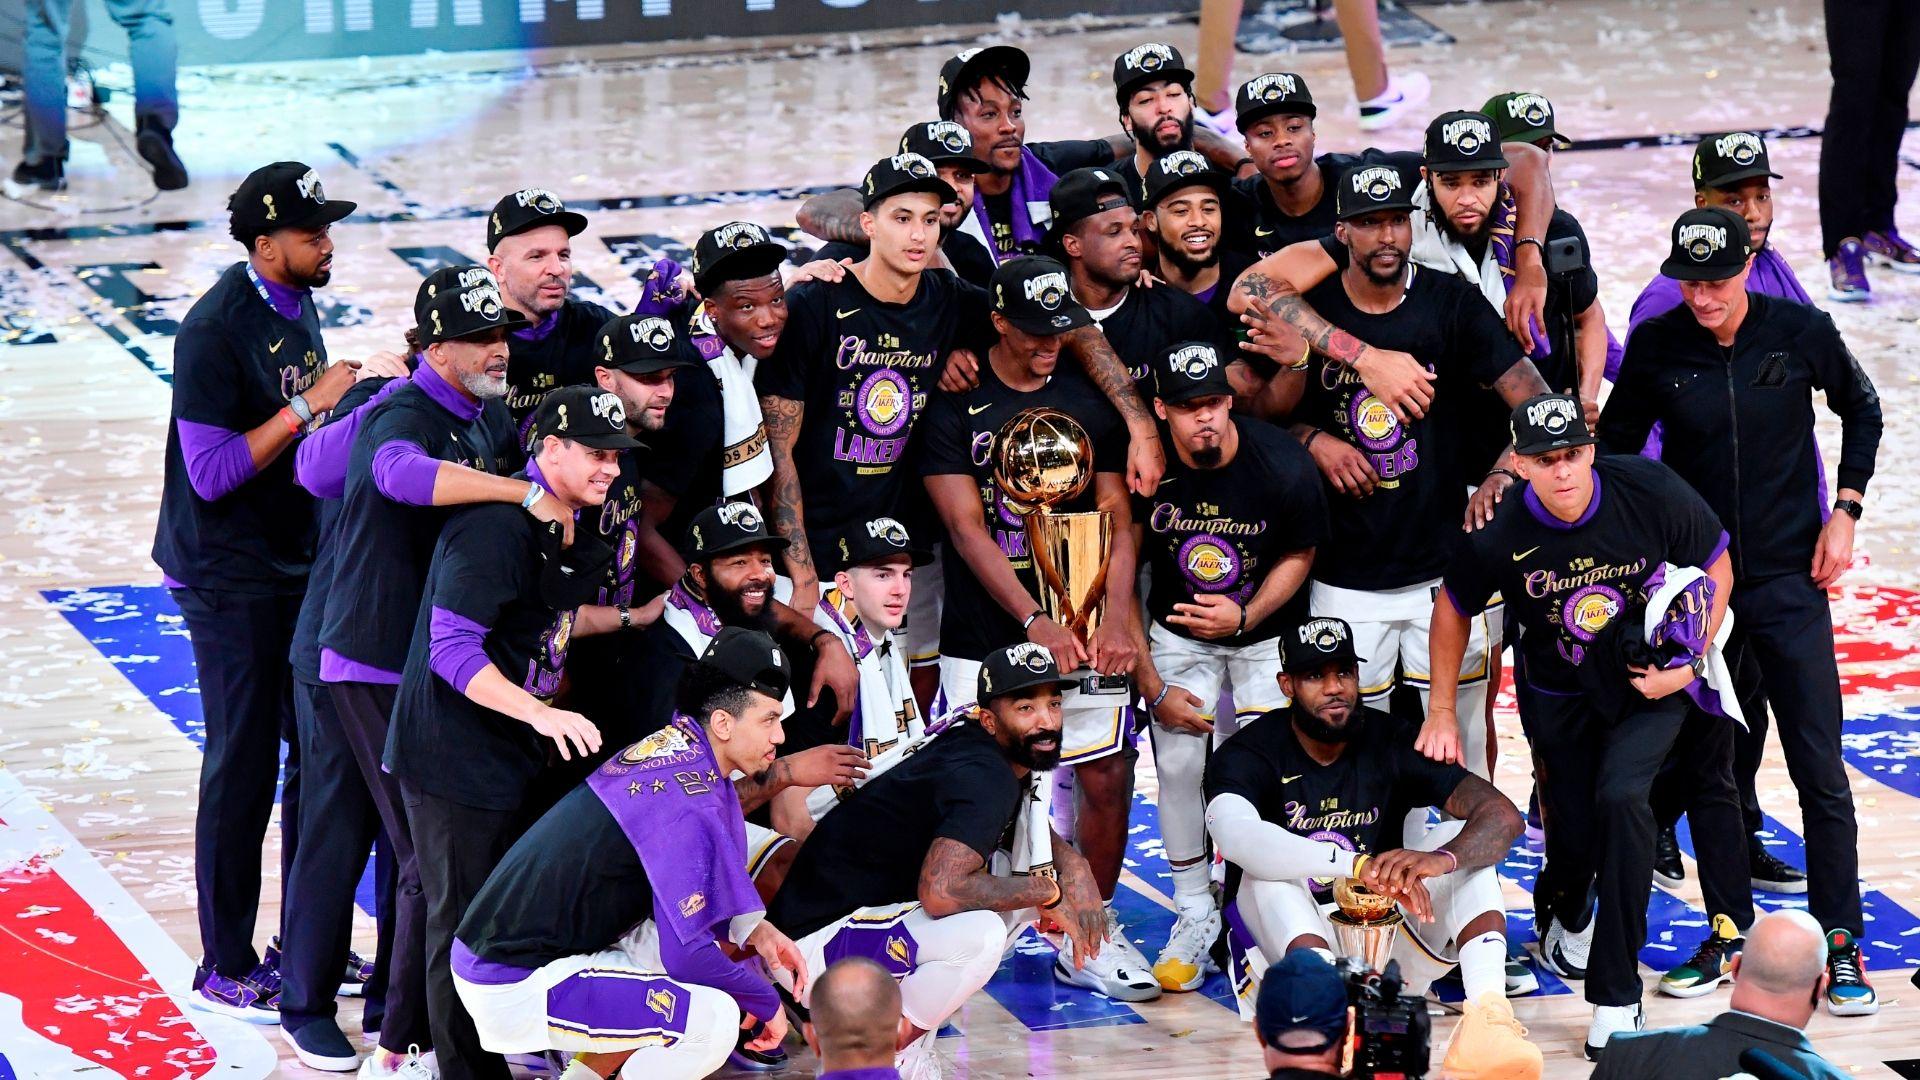 Los Angeles Lakers 2020 NBA Finals Champions Wallpapers - Wallpaper Cave